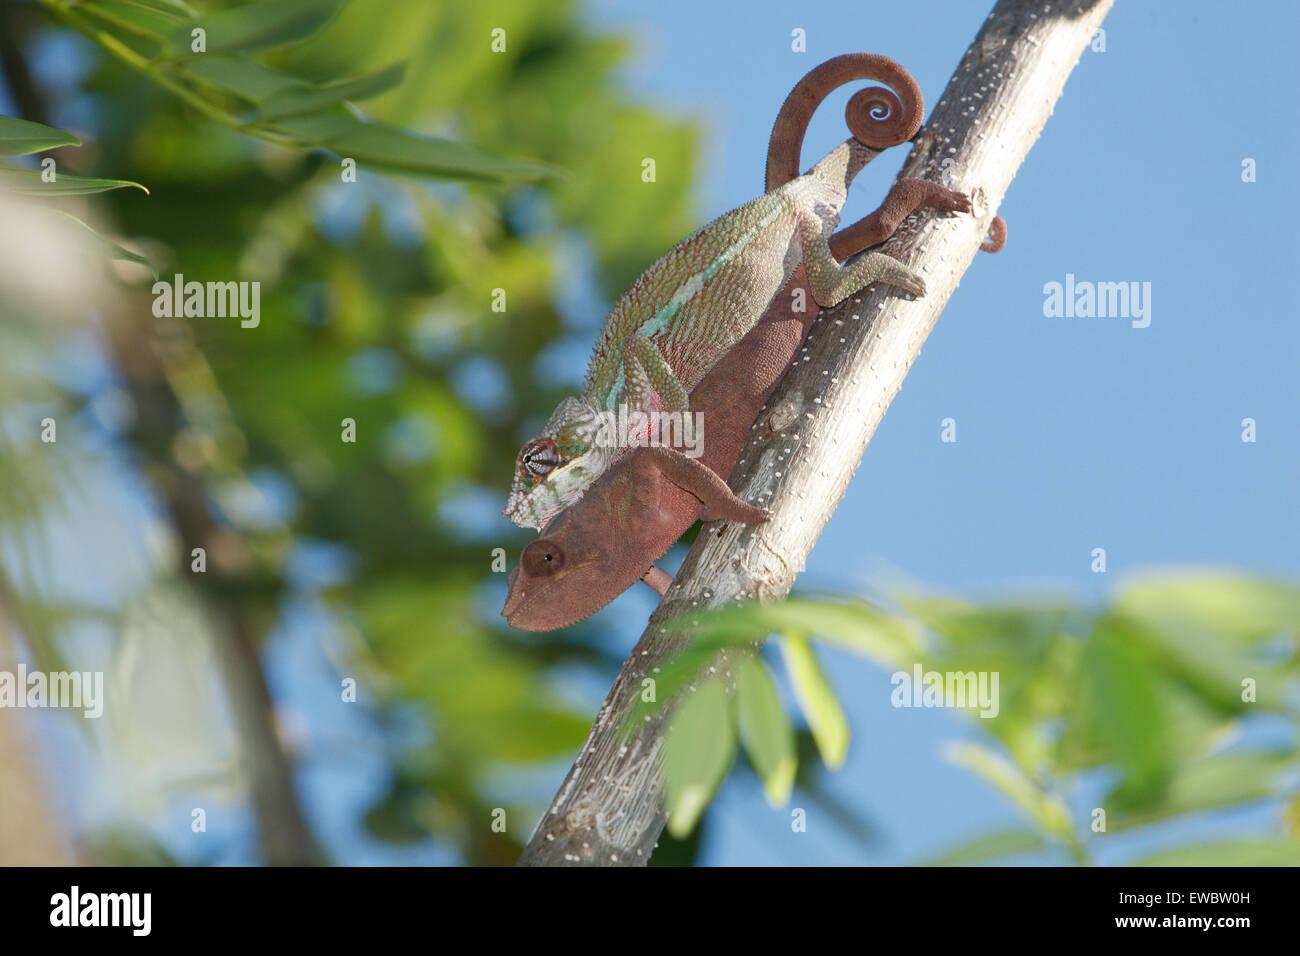 Paarung Panther Chamäleons (Furcifer Pardalis) Maroantsetra, Madagaskar Stockfoto